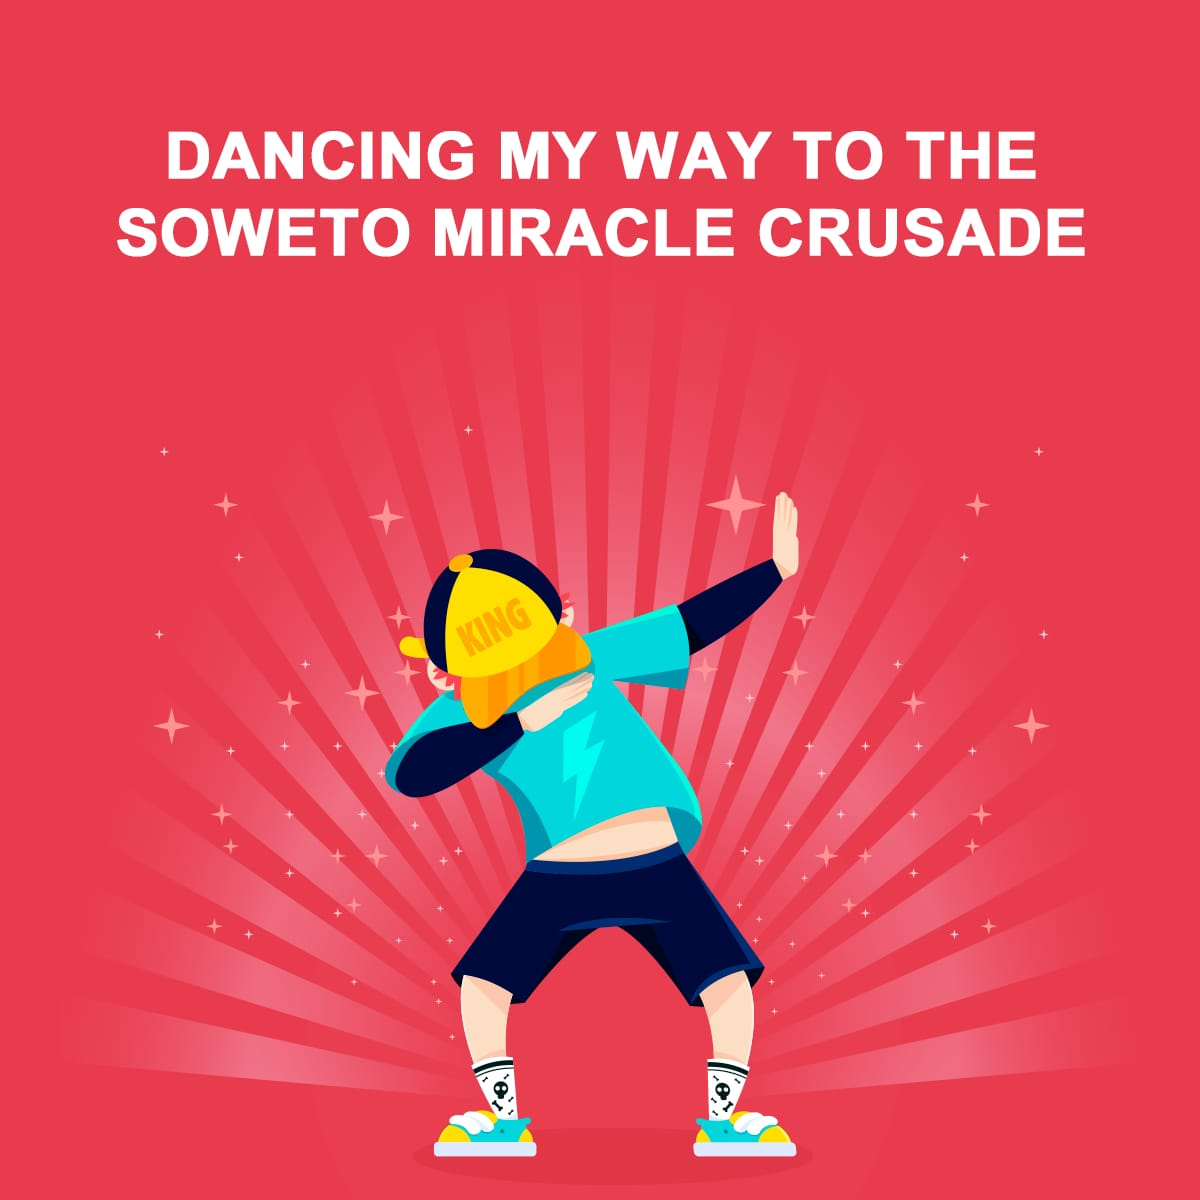 Dabbing moments 😄😄😄 @SMC! #SowetoMiracleCrusad